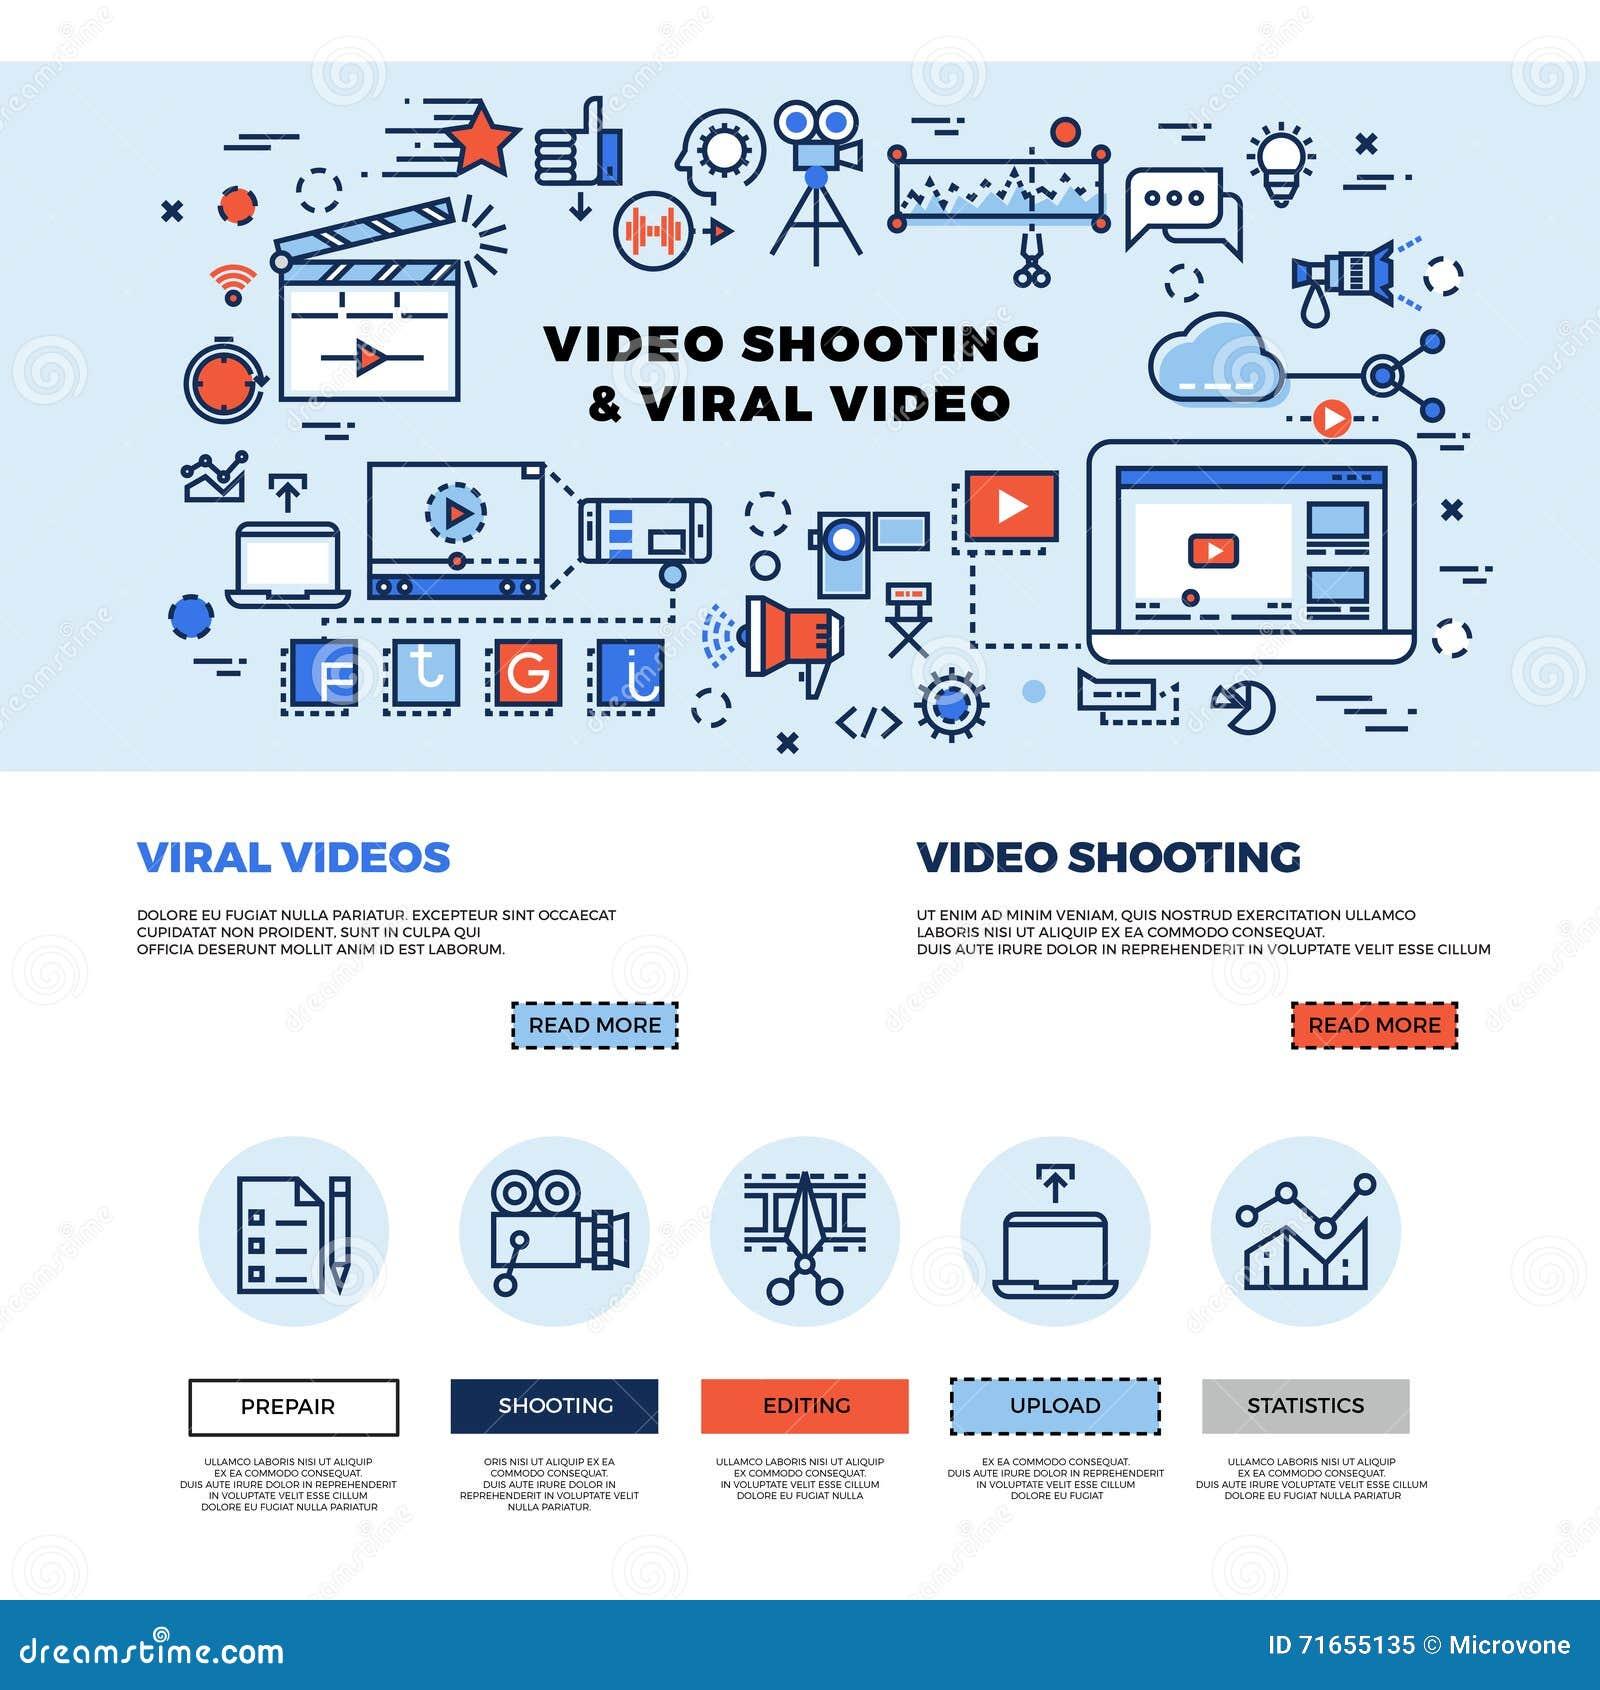 Viral Times Web: Viral Video Marketing, Movie Film-making, Professional TV